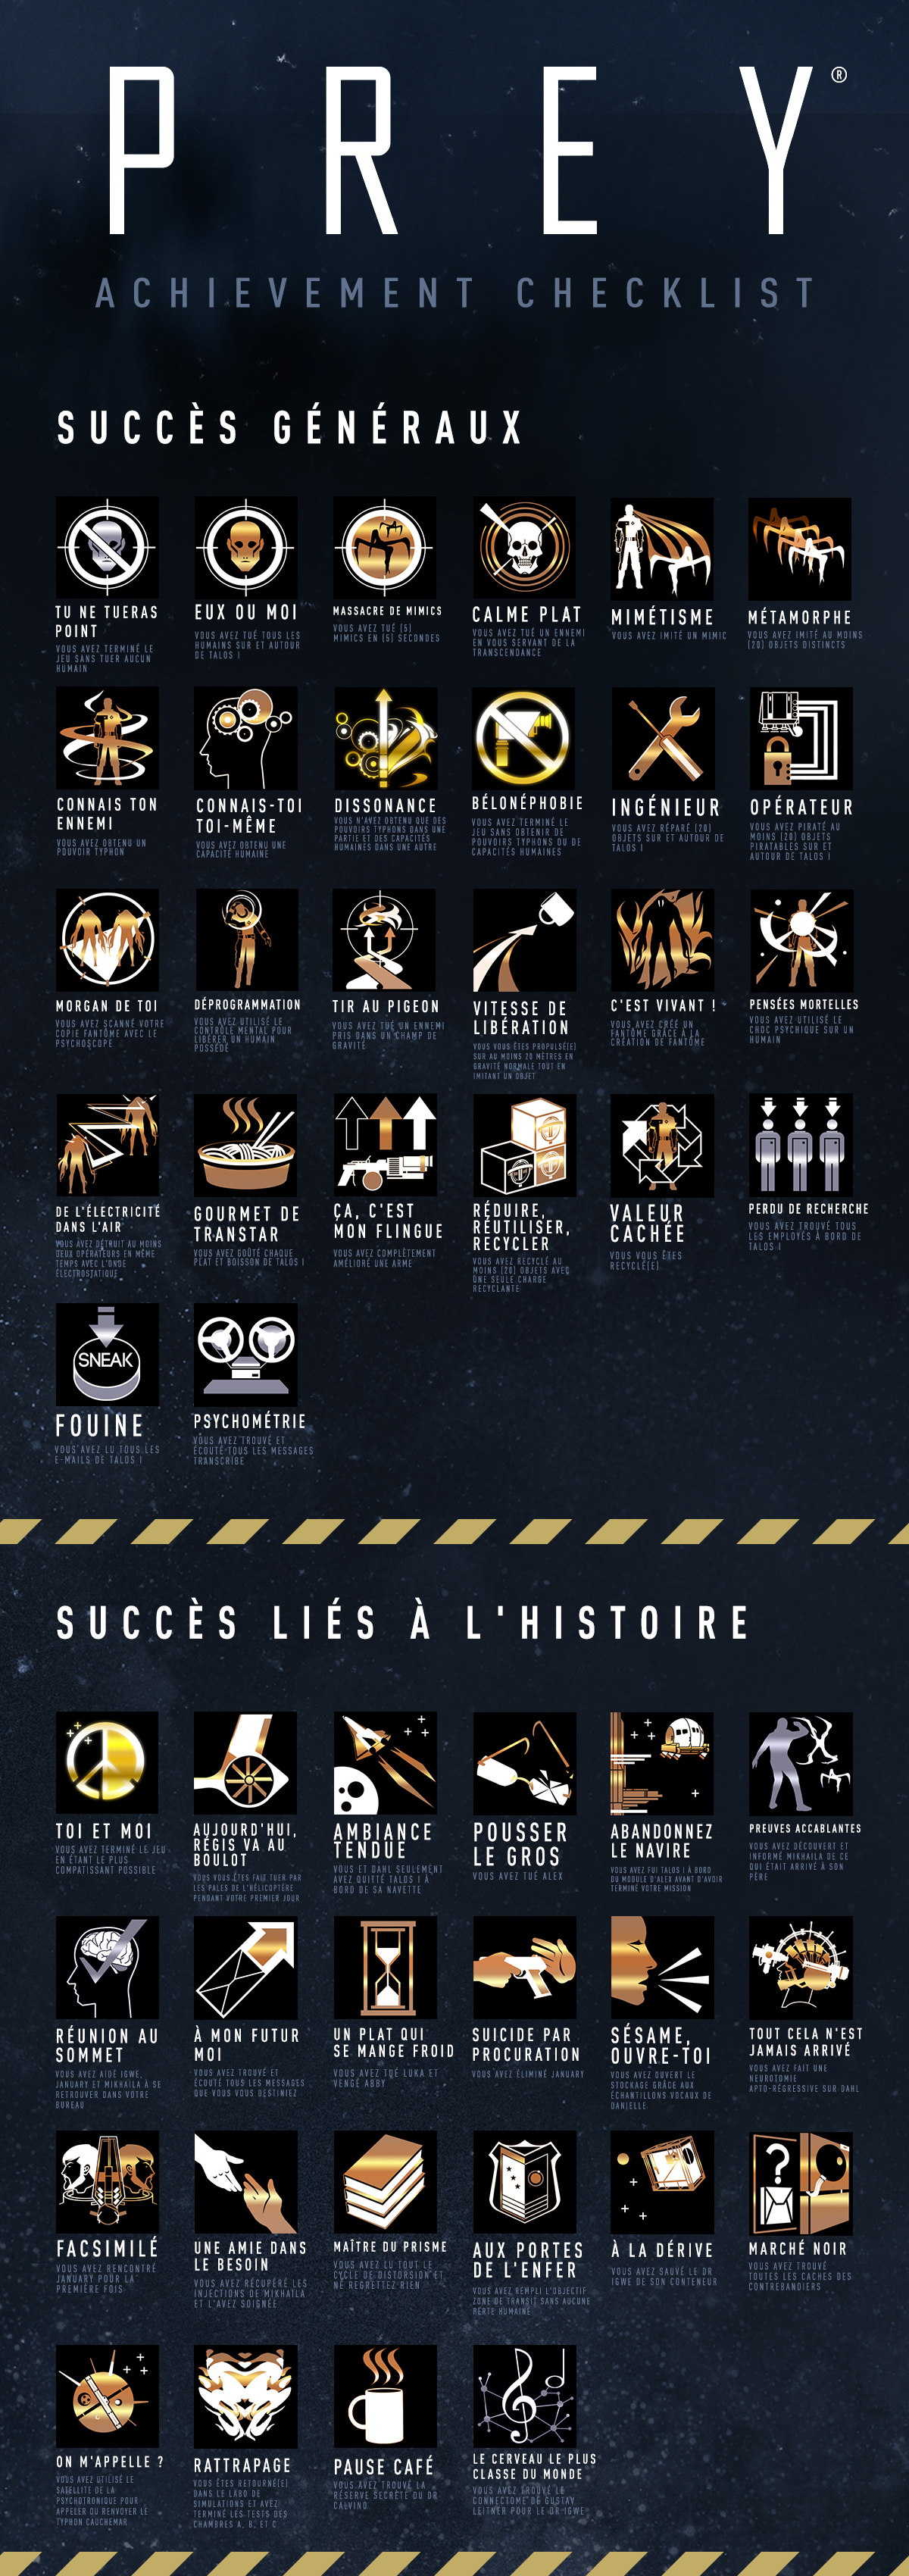 Prey : Hauts Faits, Achievement Checklist